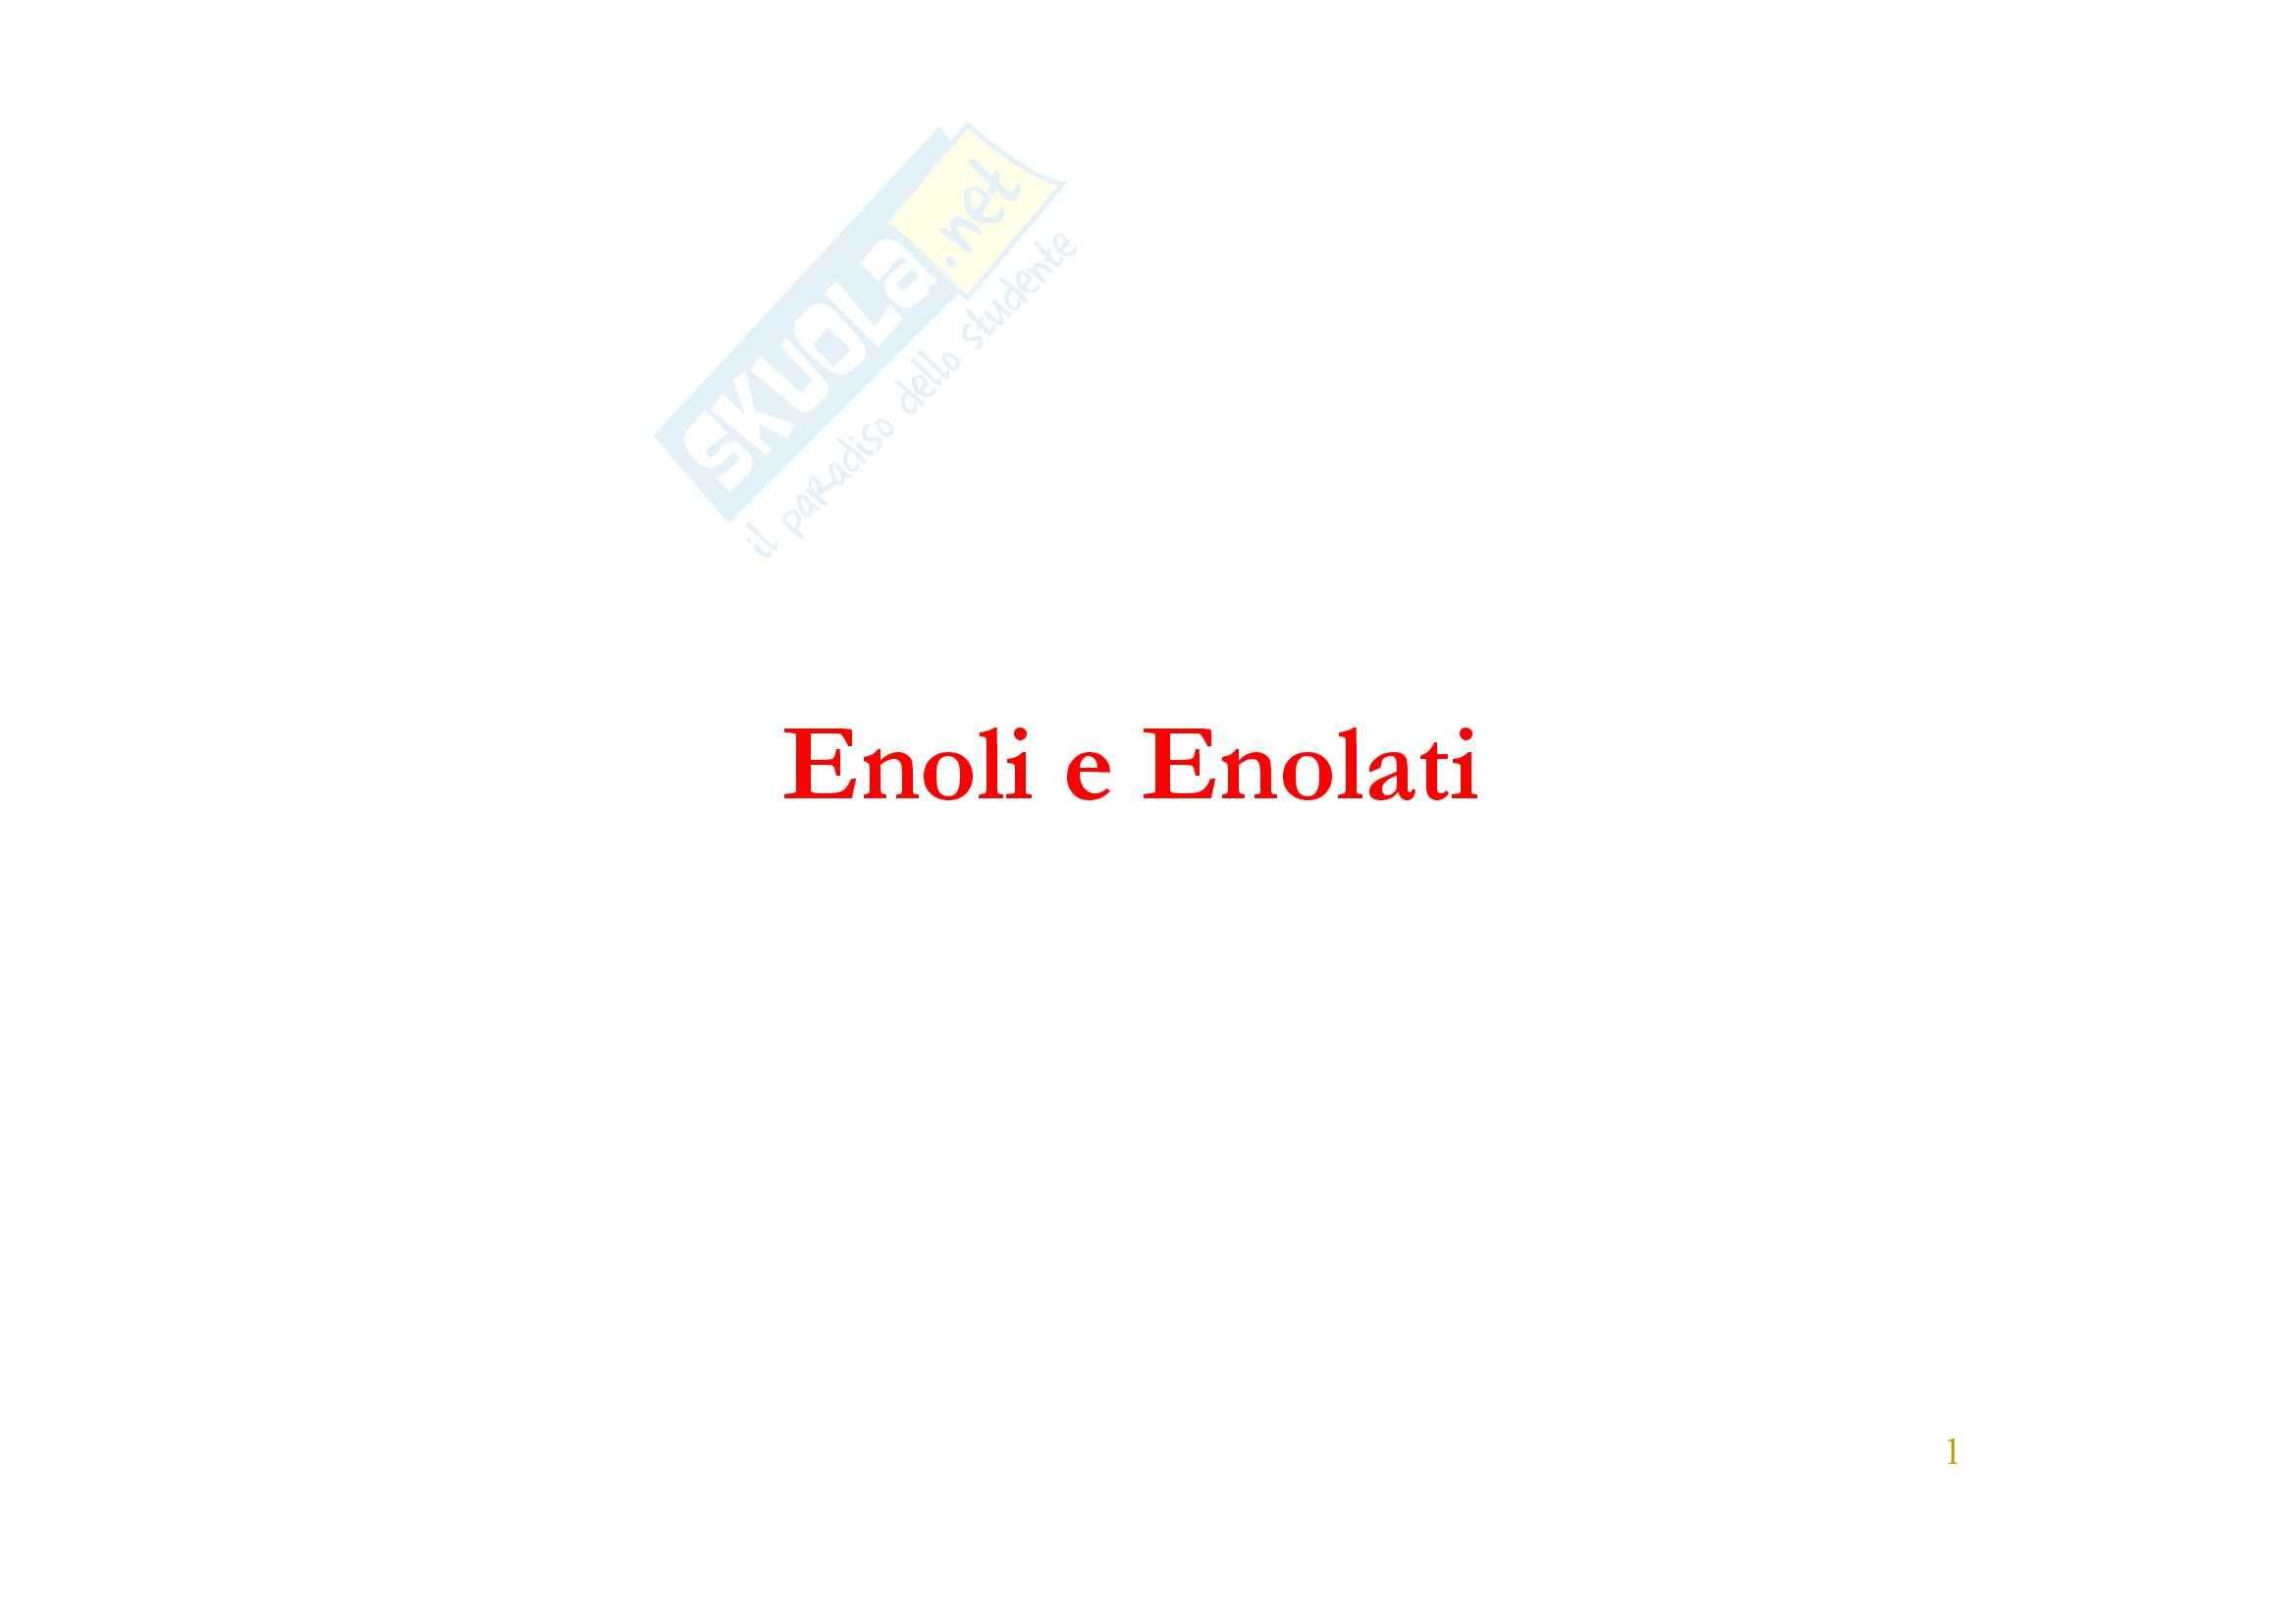 Chimica organica - enoli ed enolati